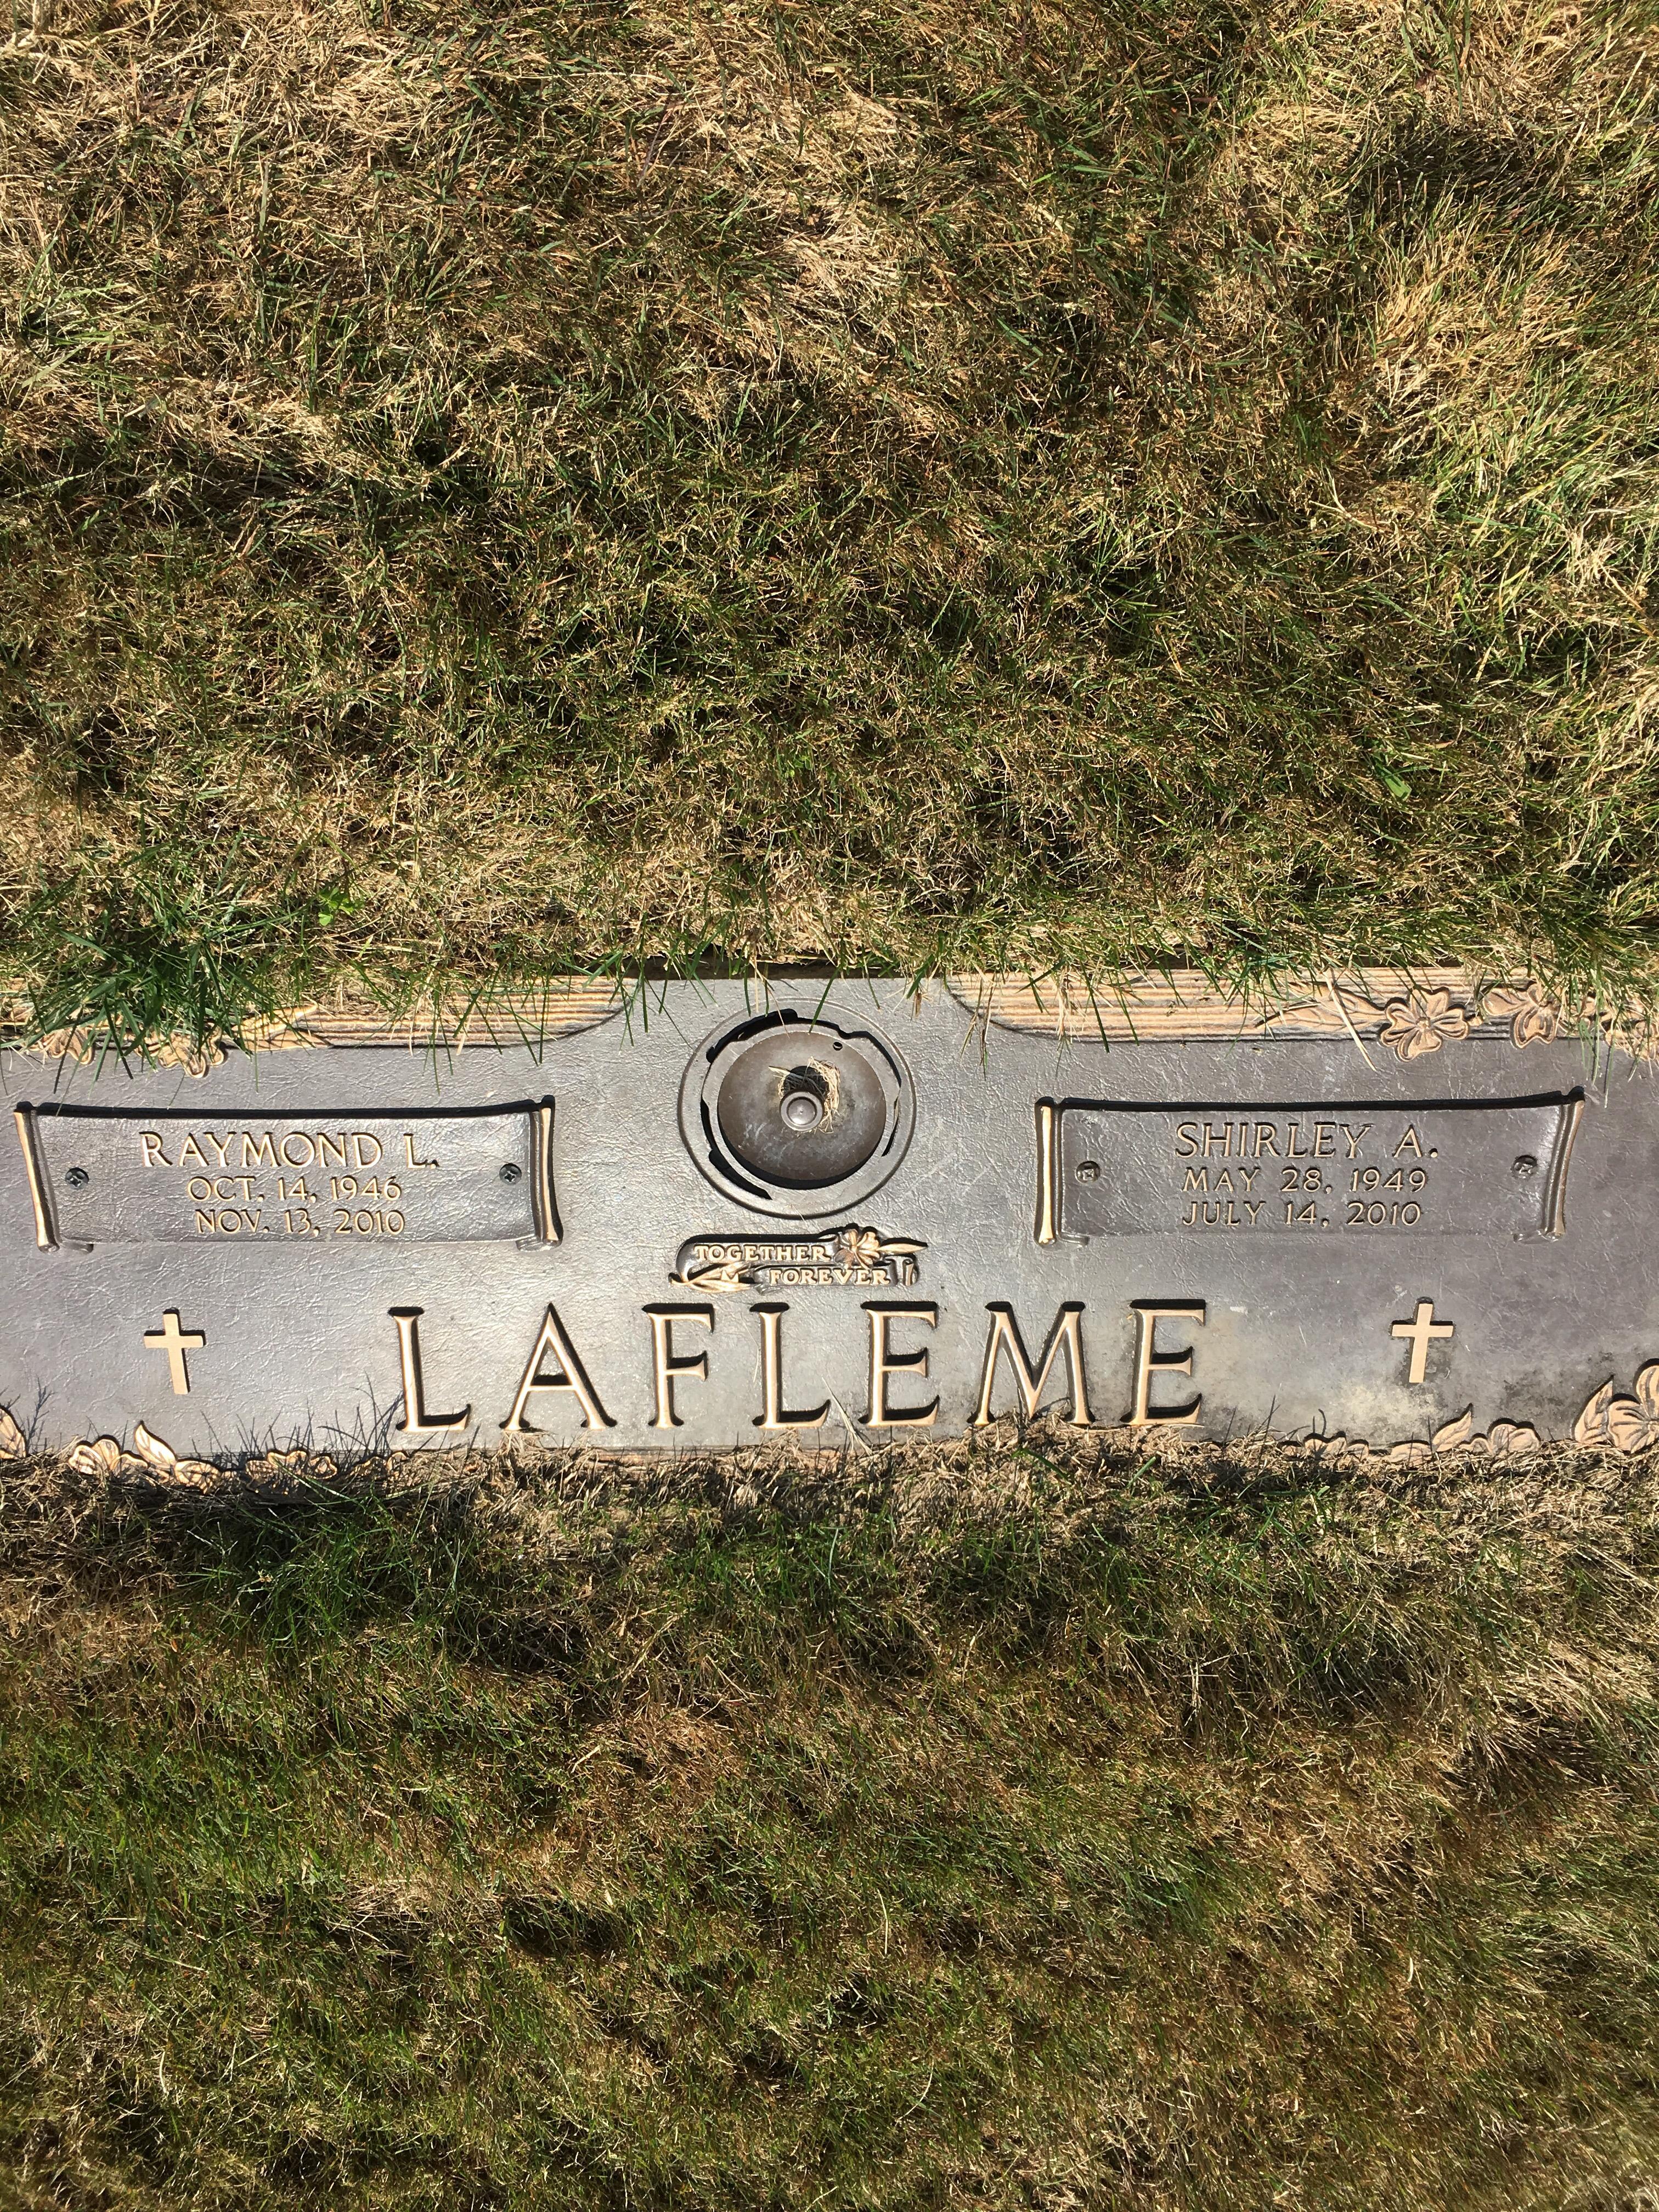 Raymond L LaFleme